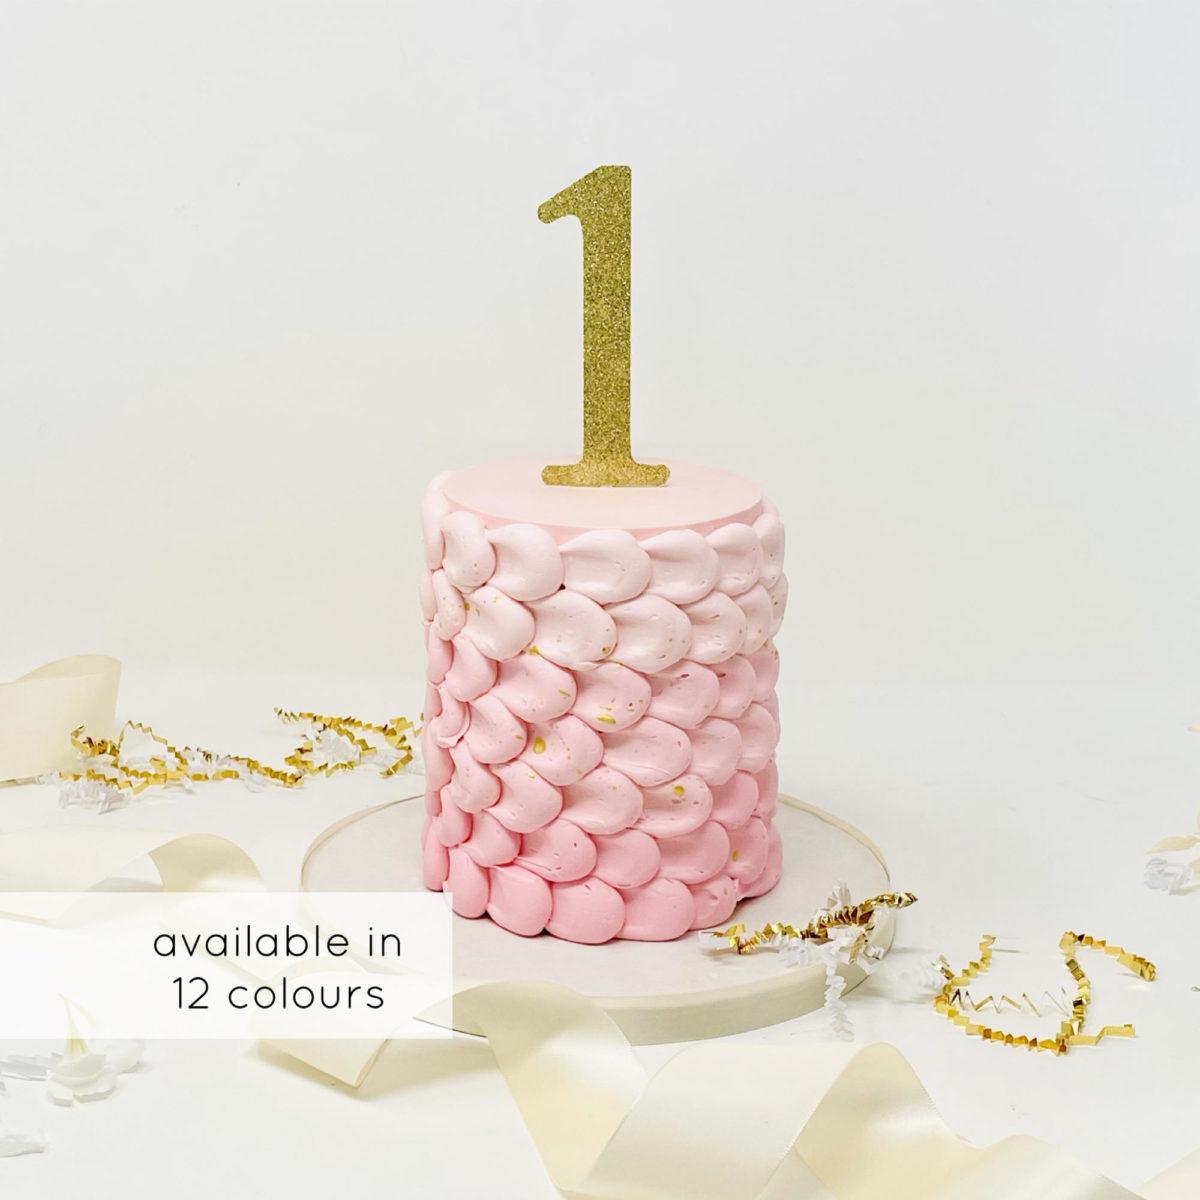 Luxe Petal Smash Cake